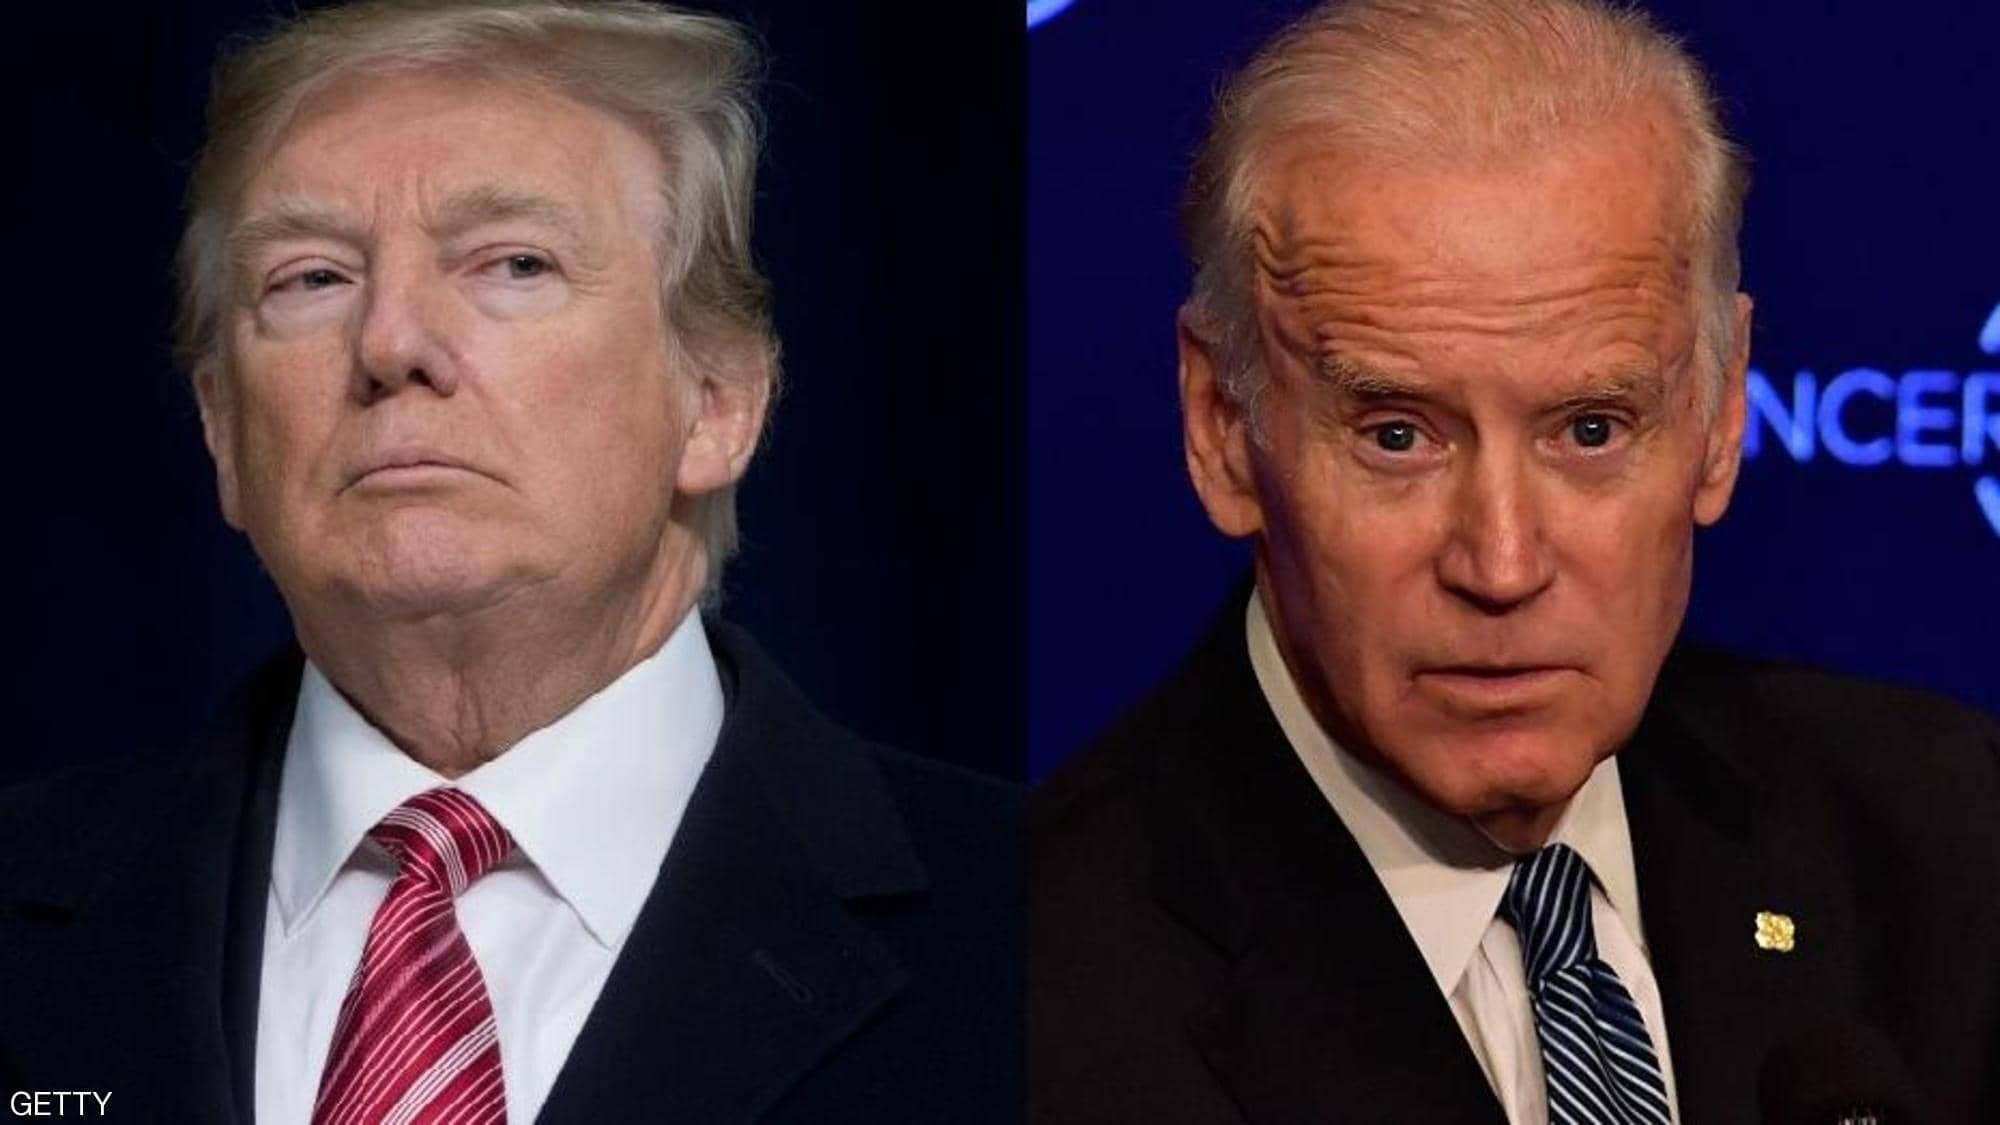 Qatar' former Prime Minister: Biden might win